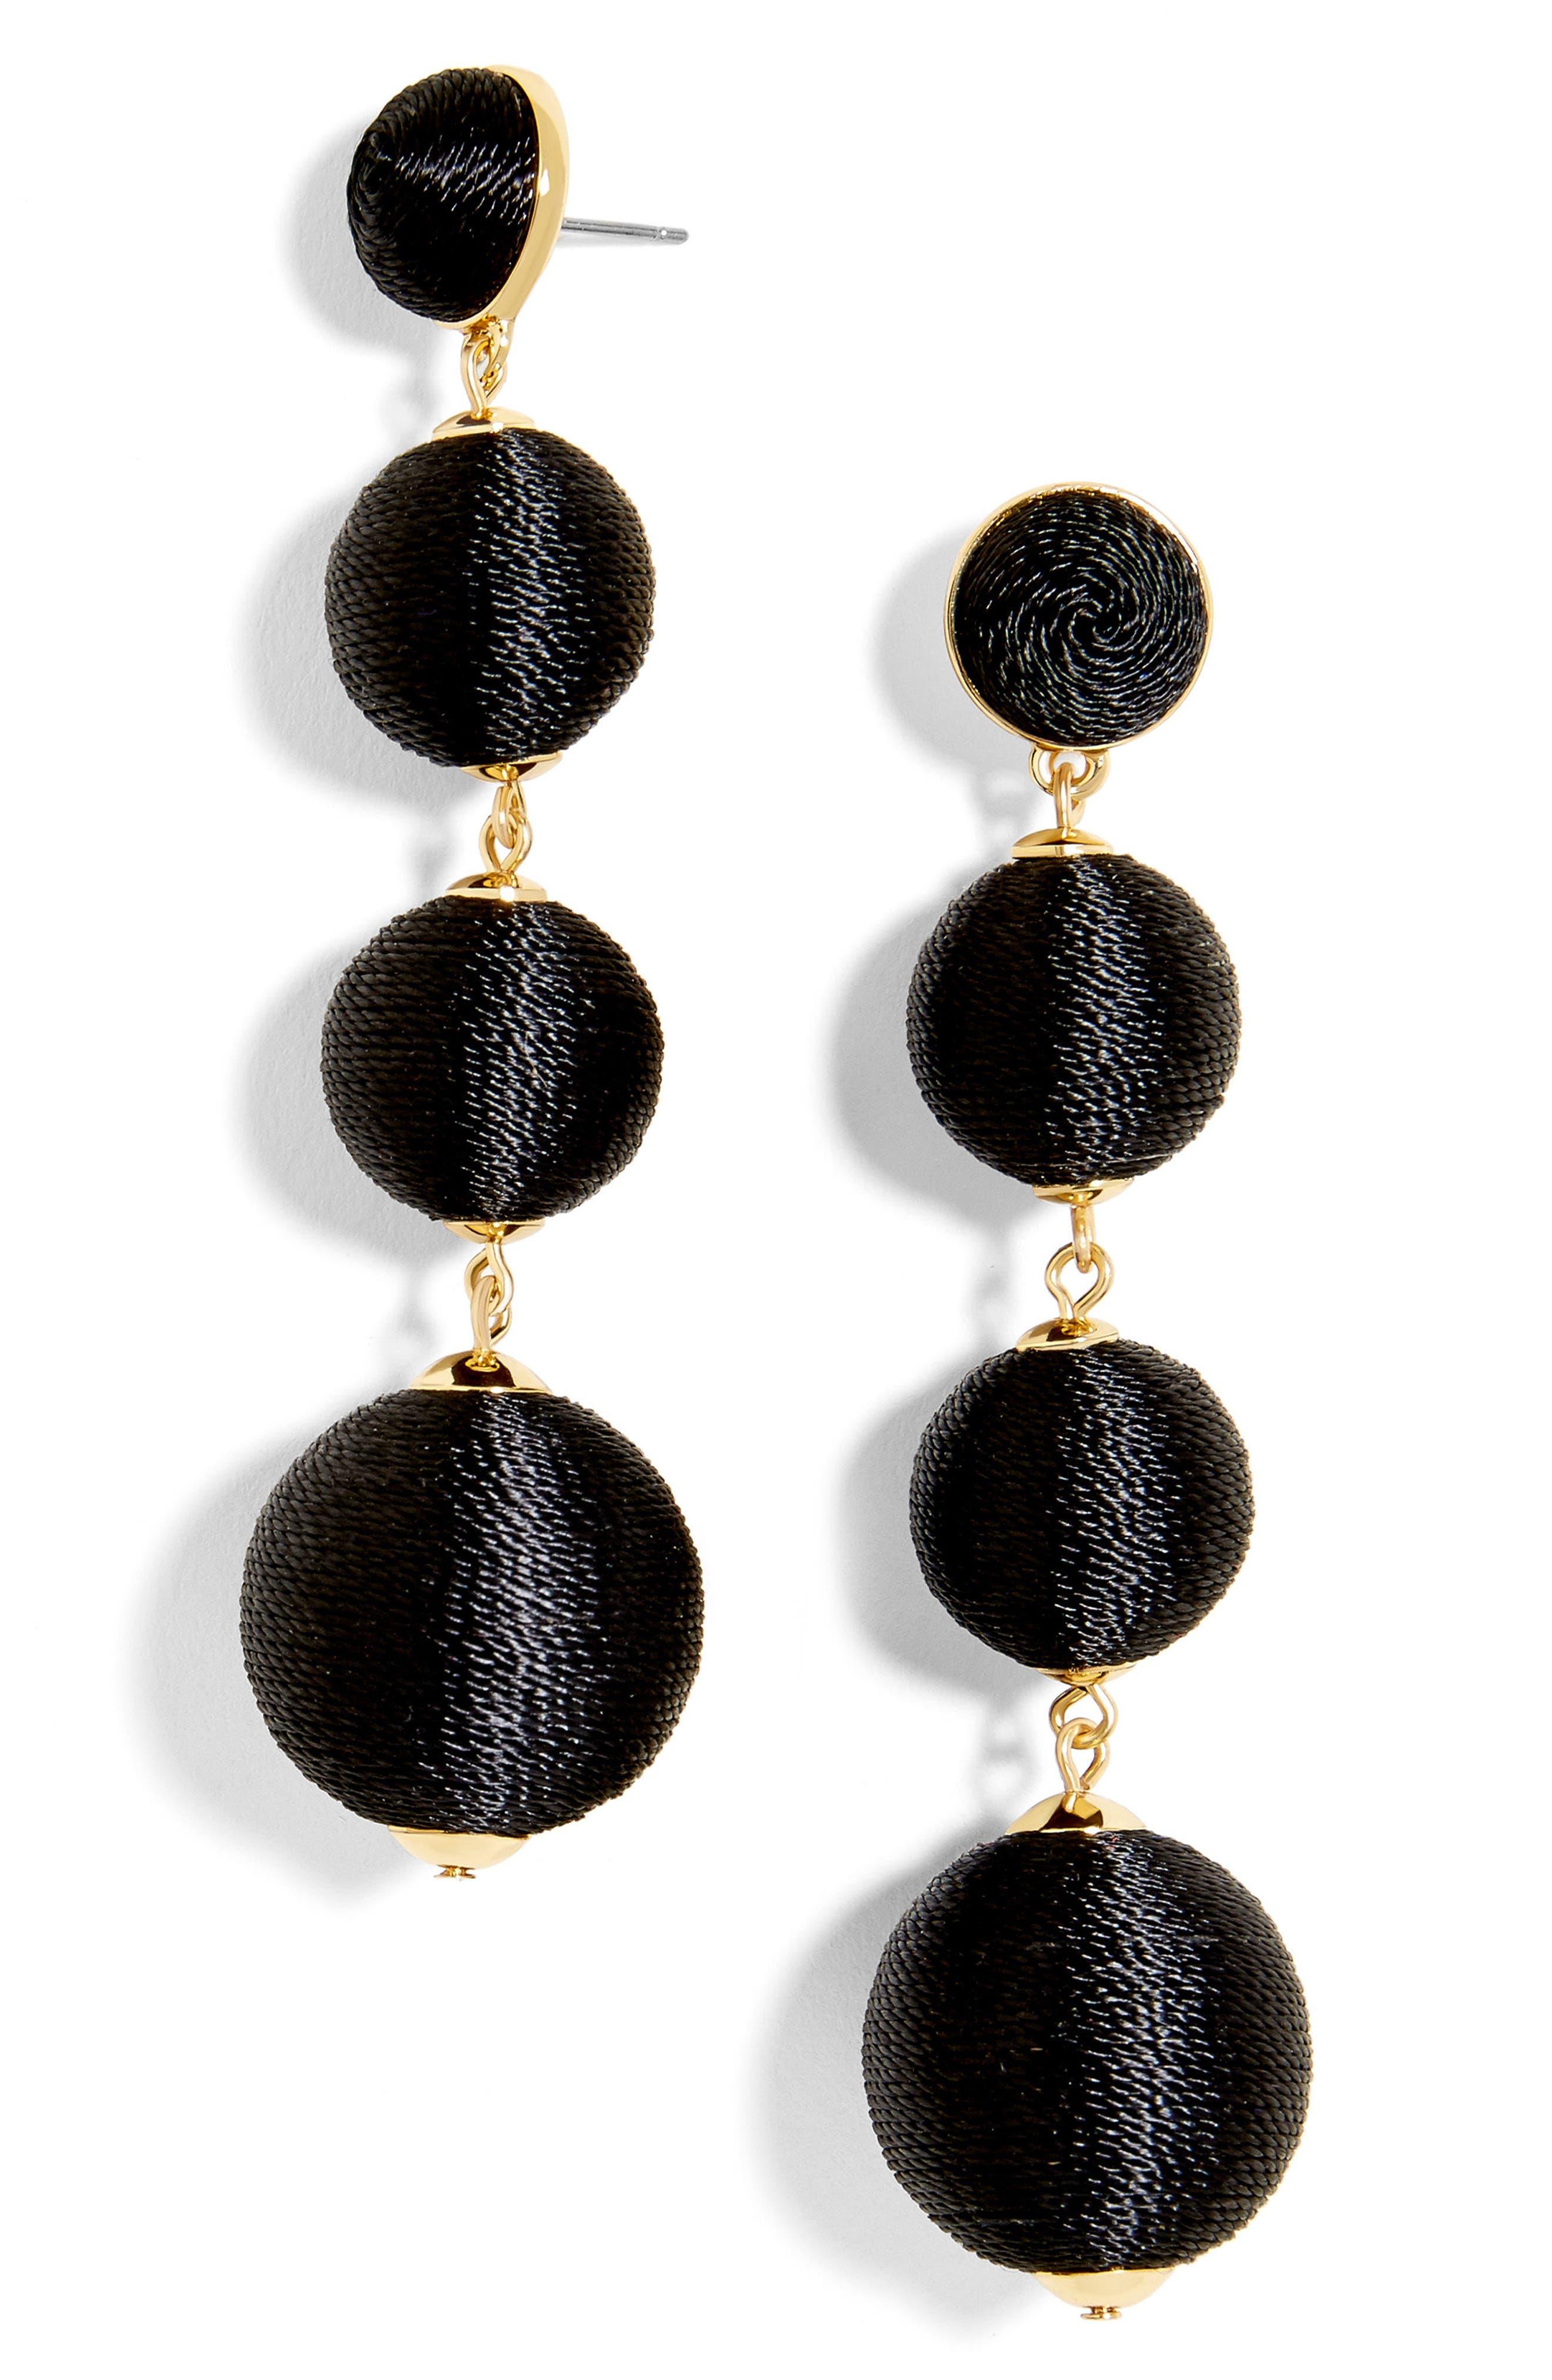 Criselda Ball Shoulder Duster Earrings,                             Main thumbnail 1, color,                             001